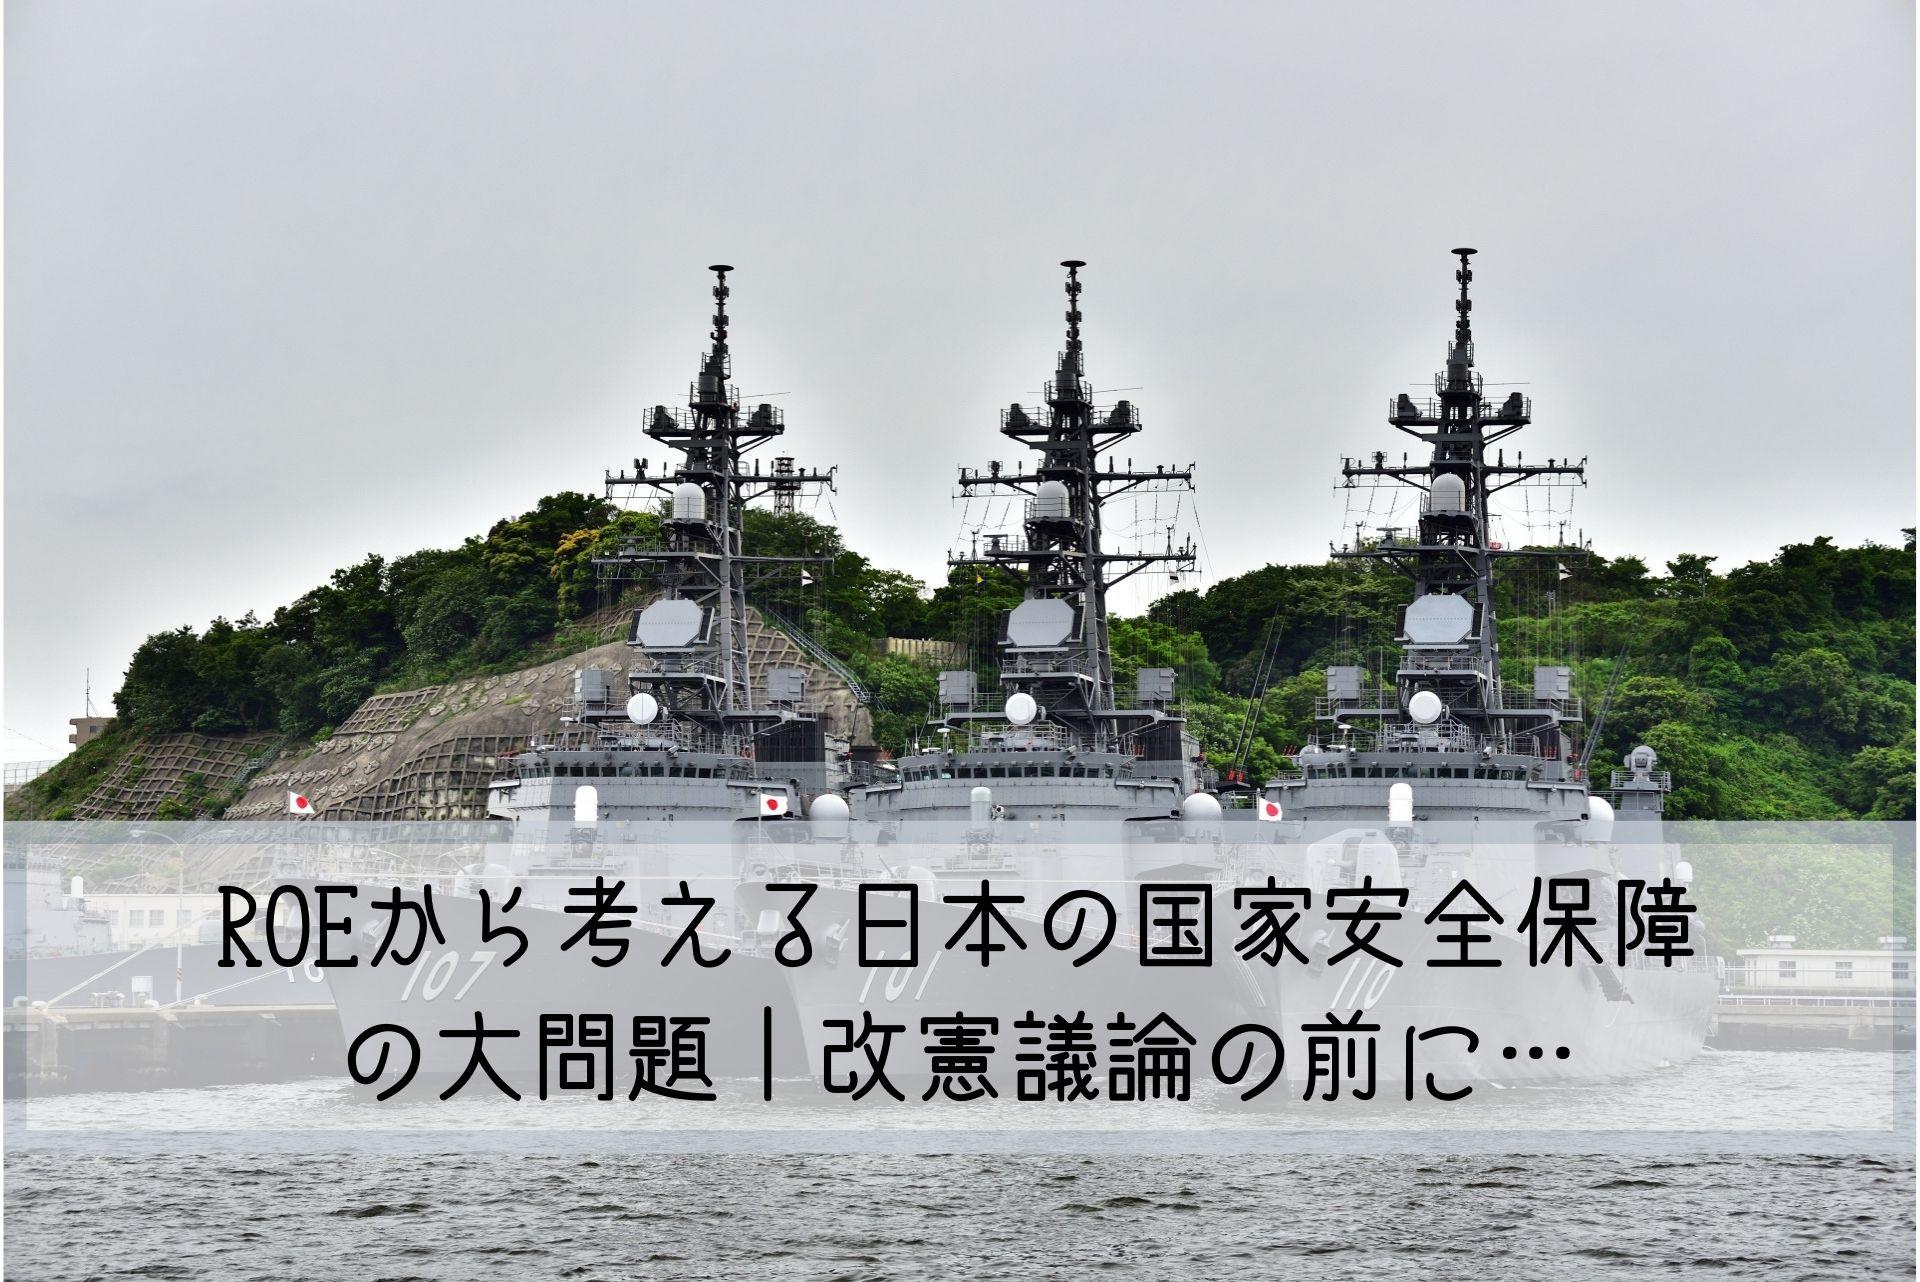 ROEから考える日本の国家安全保障の大問題 改憲議論の前に